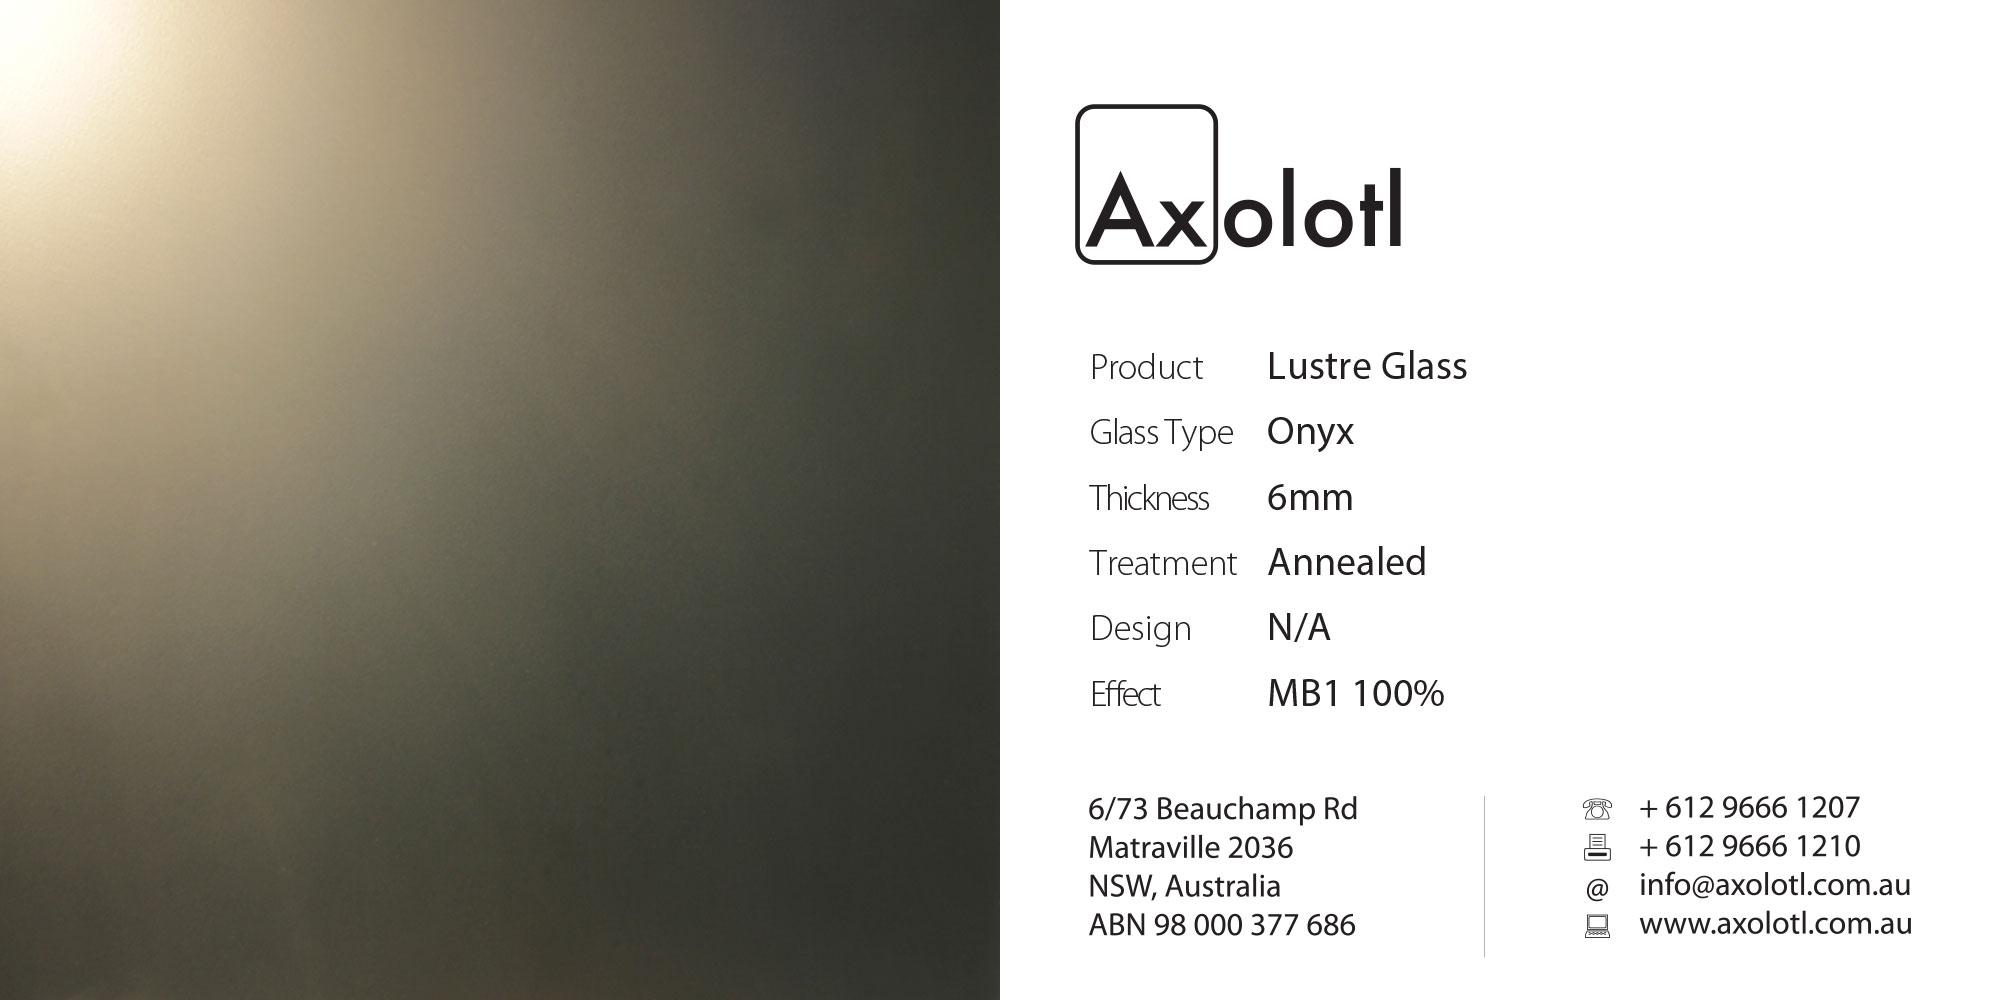 Axolotl_Glass_Lustre_Onyx.jpg